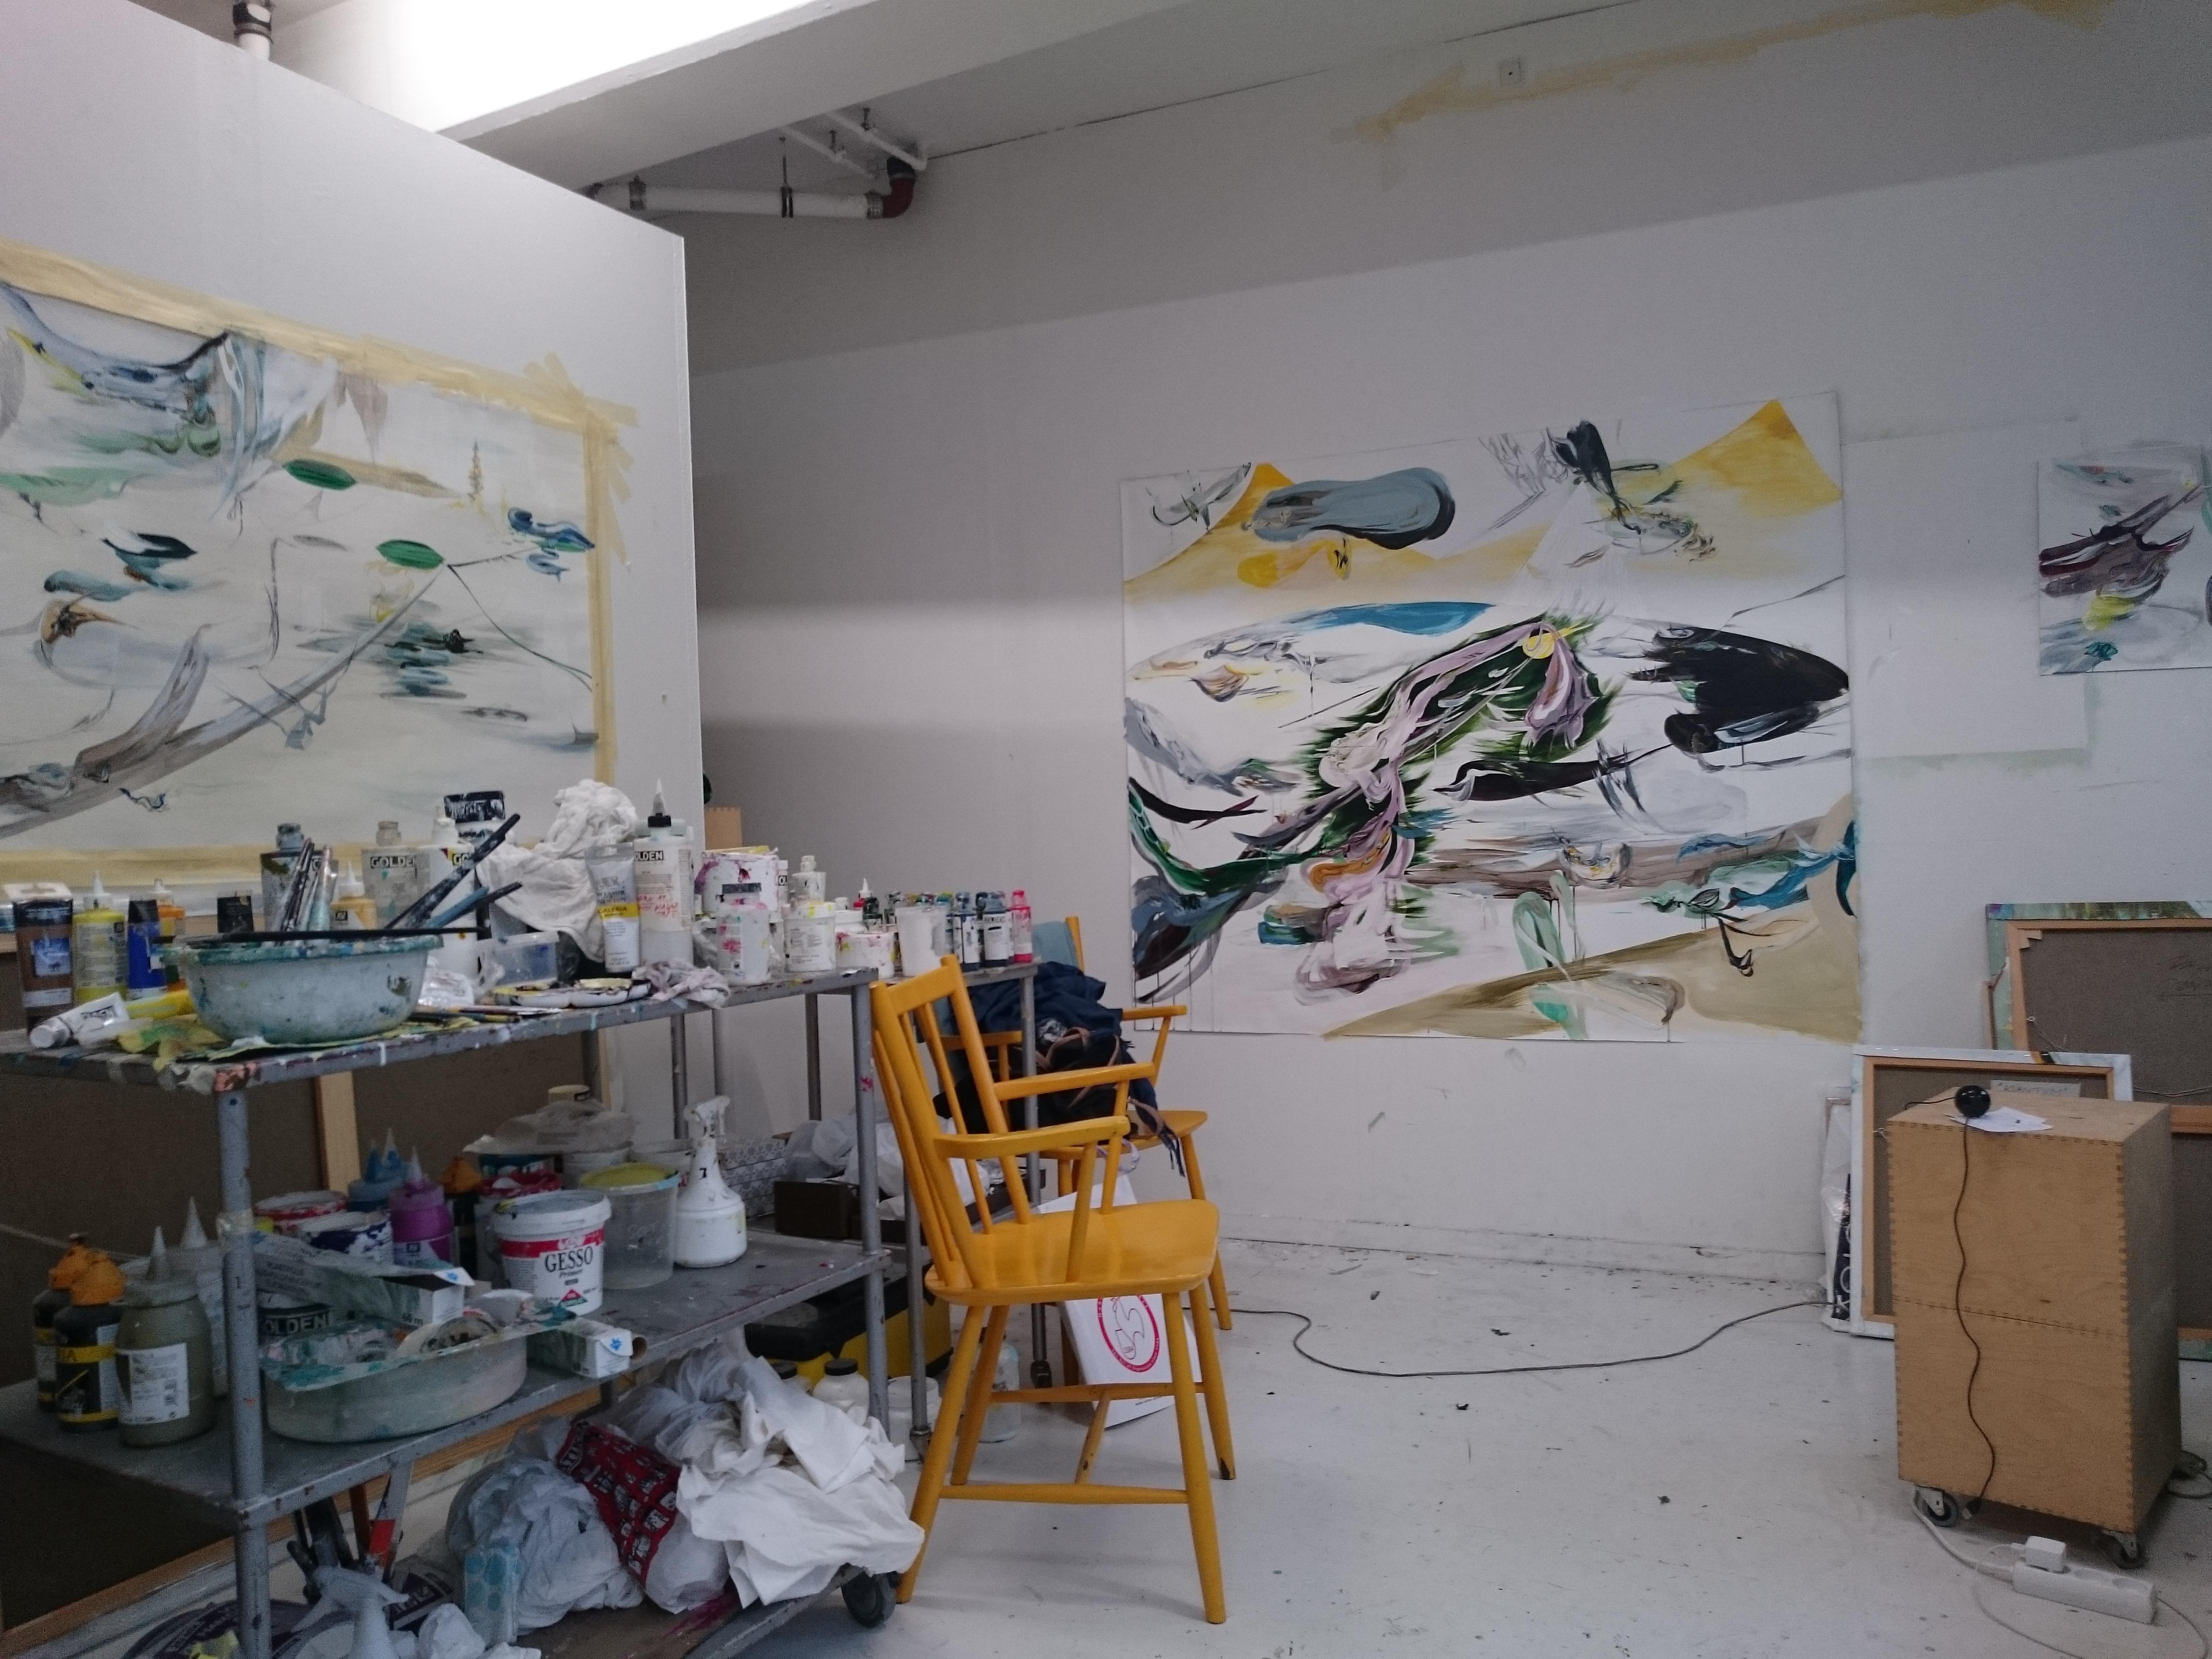 Contact / Ragnhild Joest Harbeck / Studio / Esromgade / Copenhagen 2015